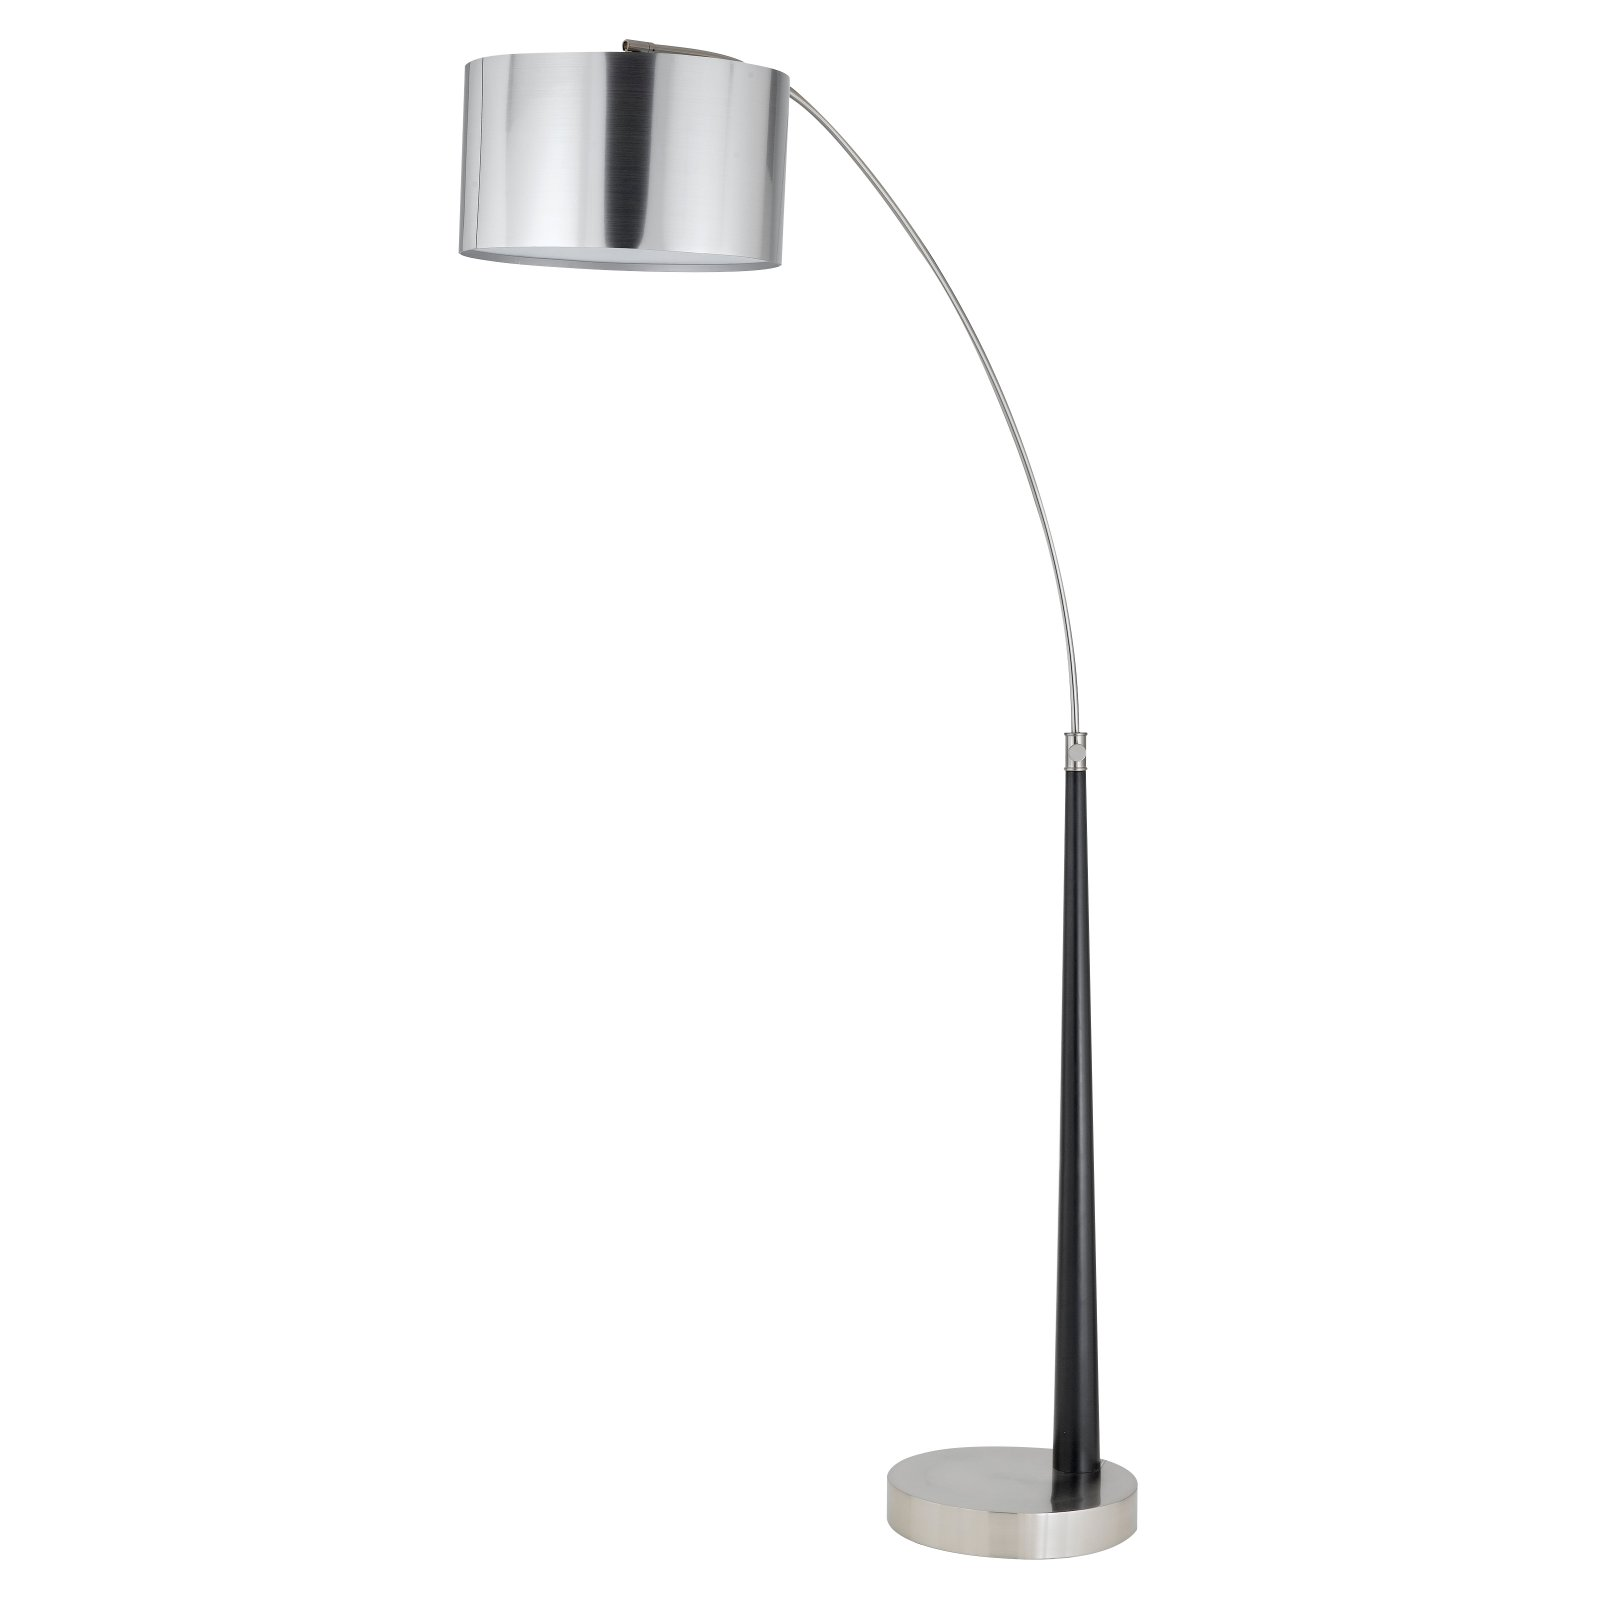 Cal Lighting BO-2029 Metal Arc Floor Lamp with Vacuum Plated PVC Shade by CAL Lighting